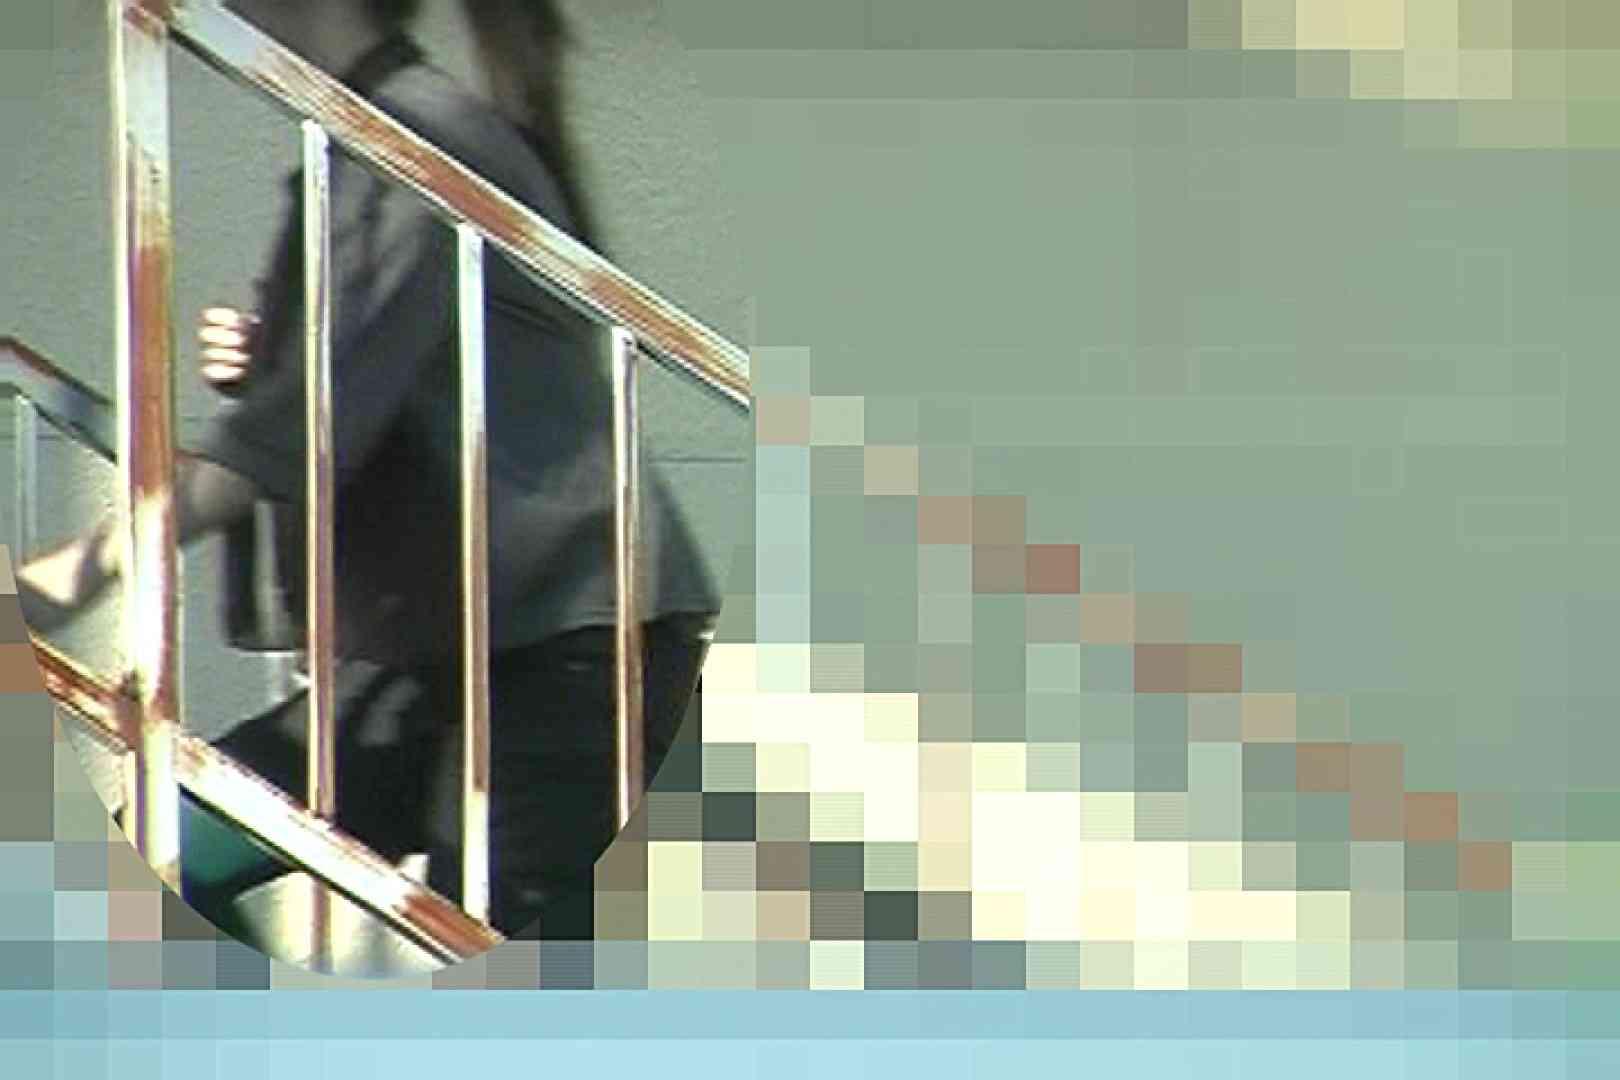 Aquaな露天風呂Vol.25 盗撮師作品   露天風呂突入  72pic 1